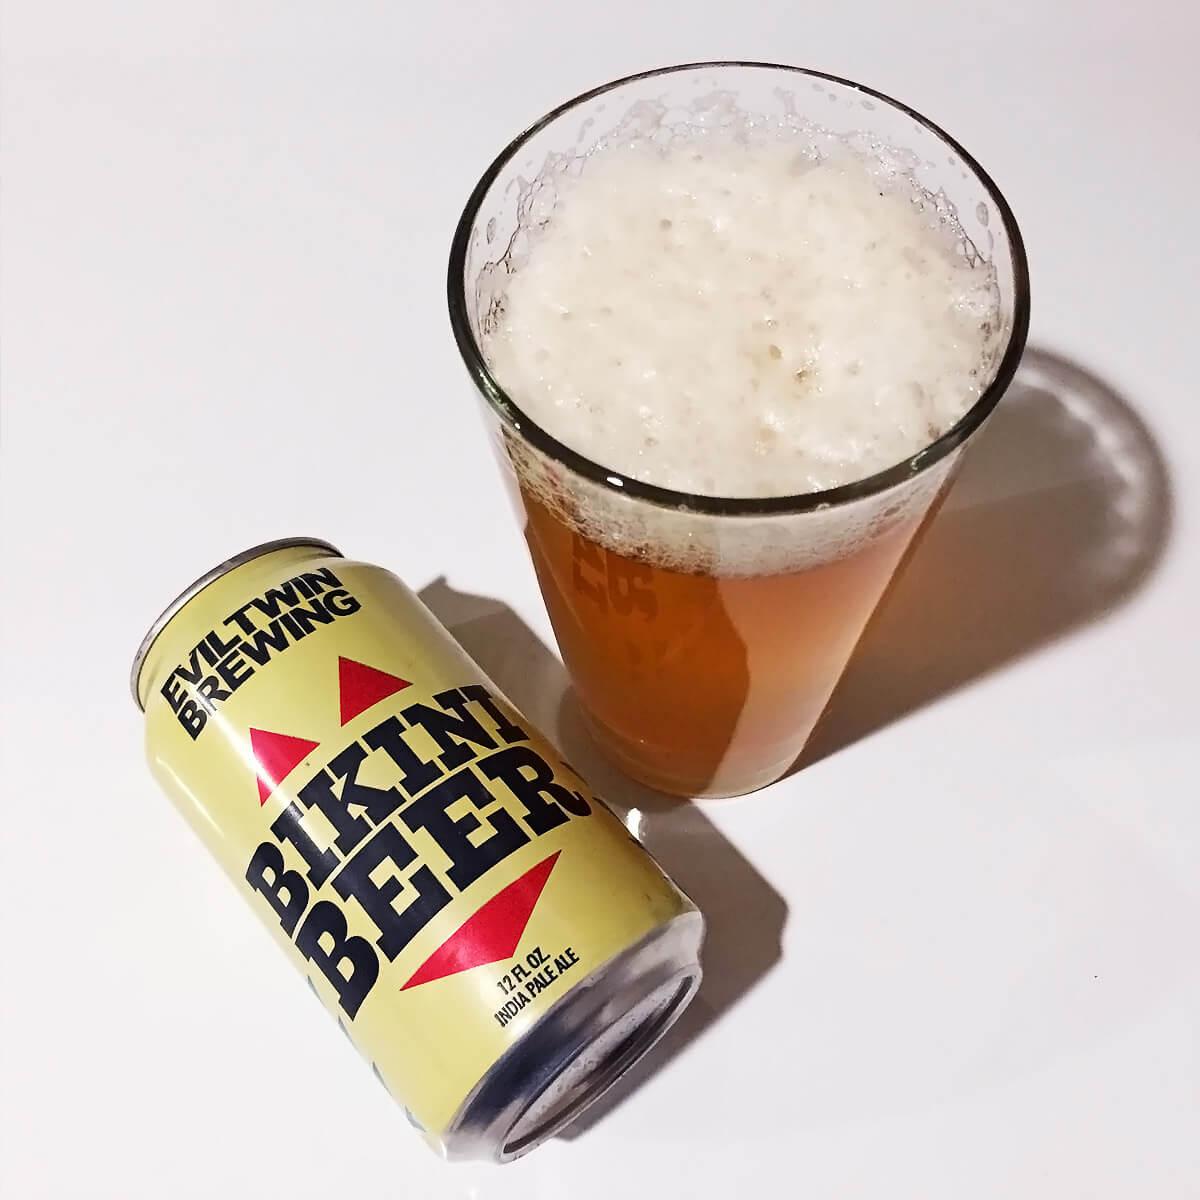 Bikini Beer, an American Session IPA by Evil Twin Brewing